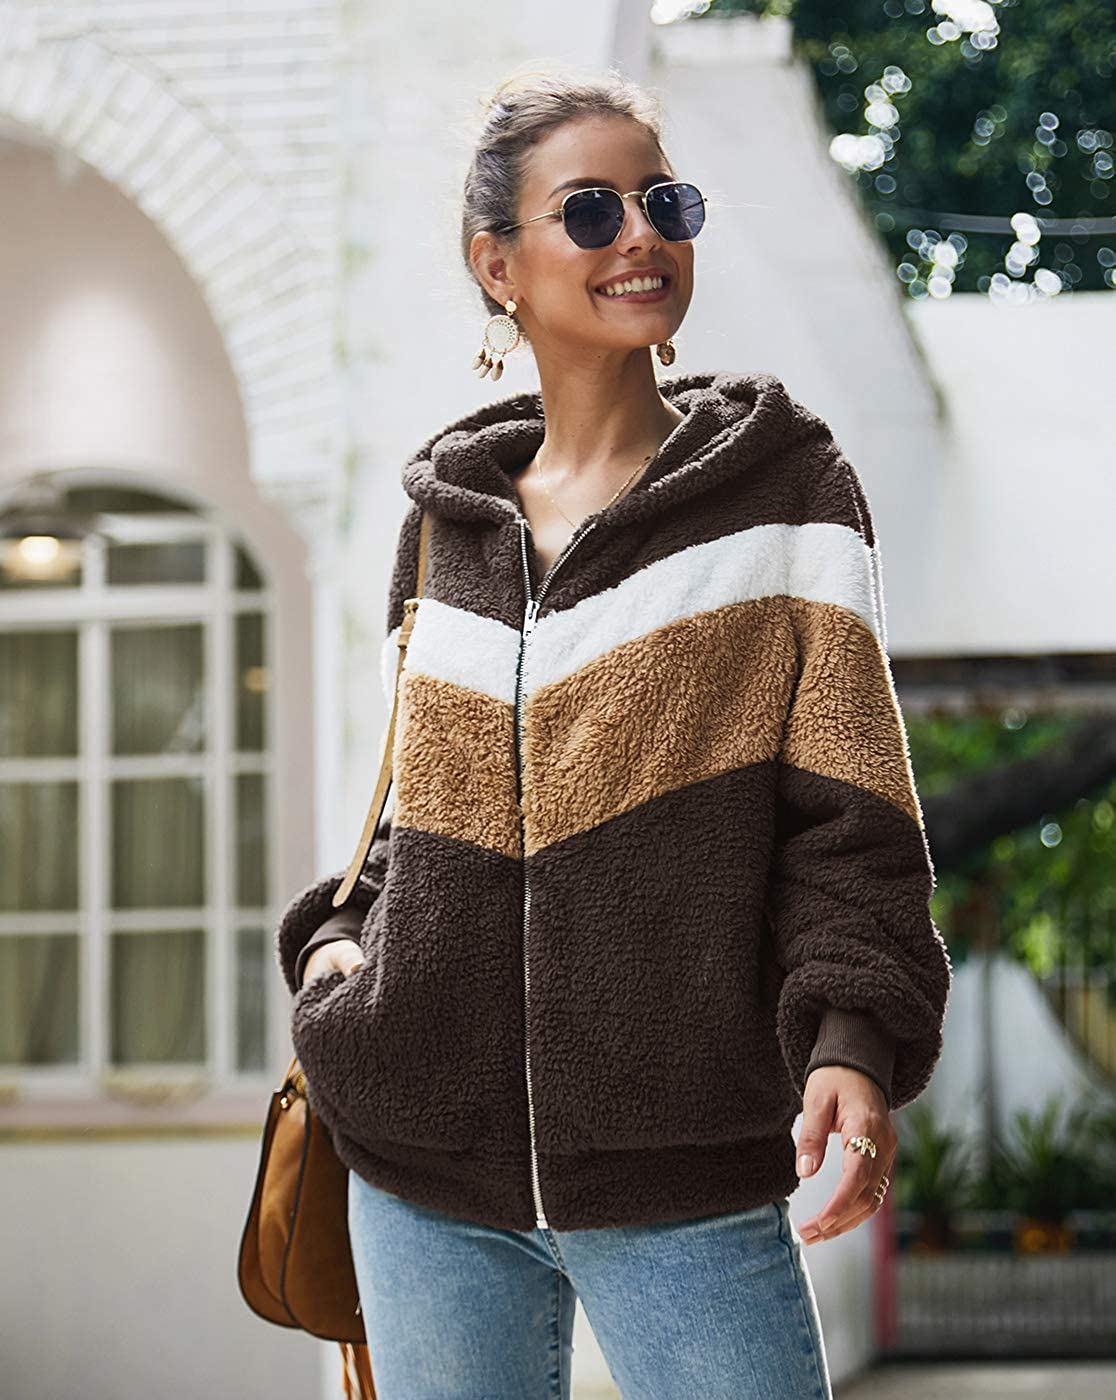 GAMISOTE Womens Faux Fur Hooded Jacket Fleece Zip Up Color Block Striped Hoodies Coat